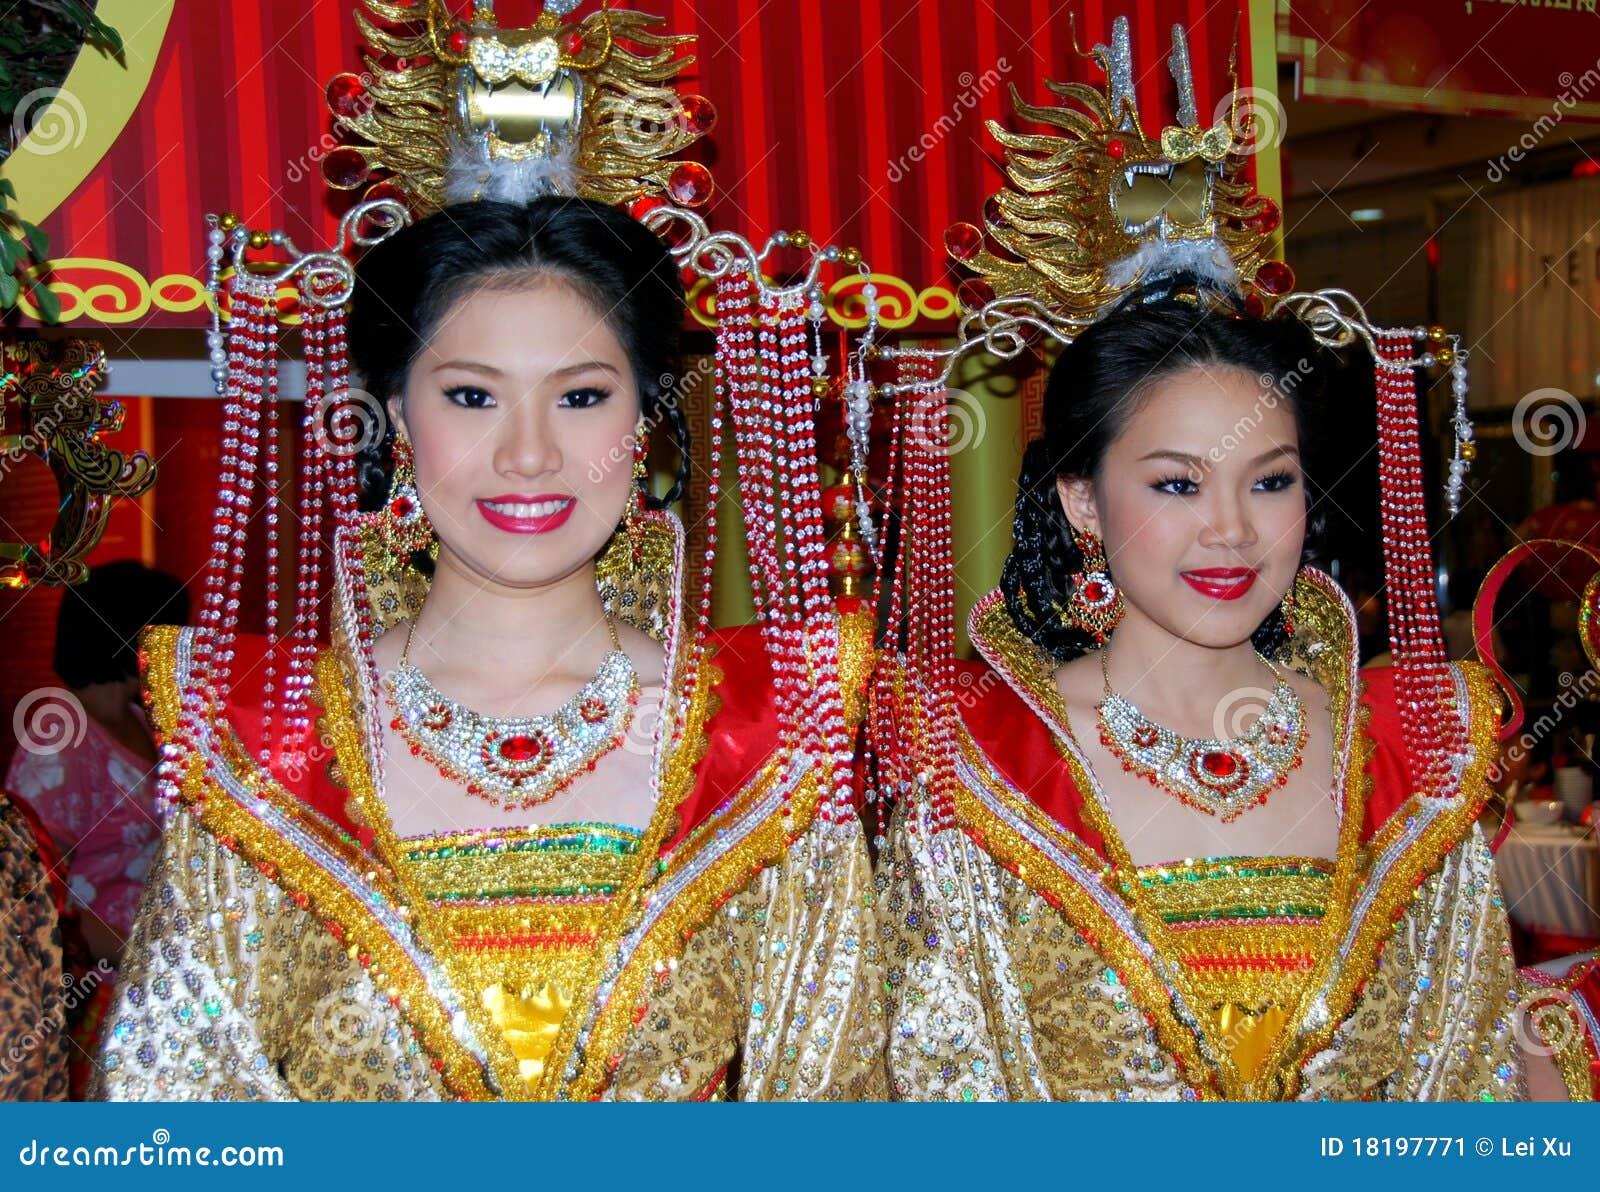 Chinese In Vrouwen Kleding Bangkok Redactionele Foto Thailand fq6Pwn0t